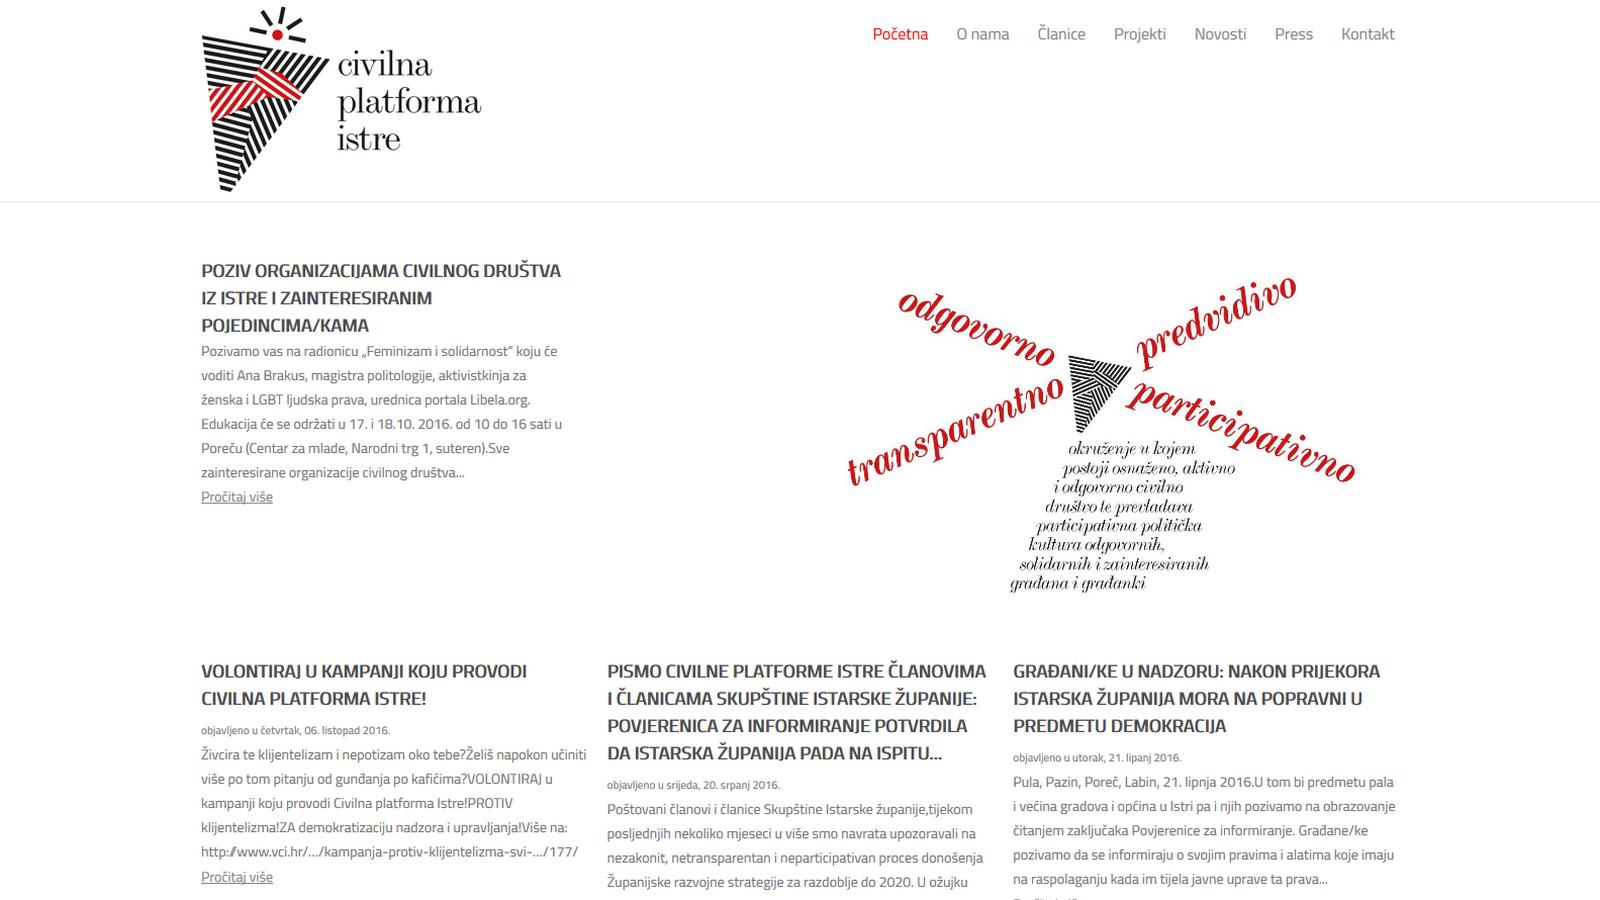 Civilna platforma Istre